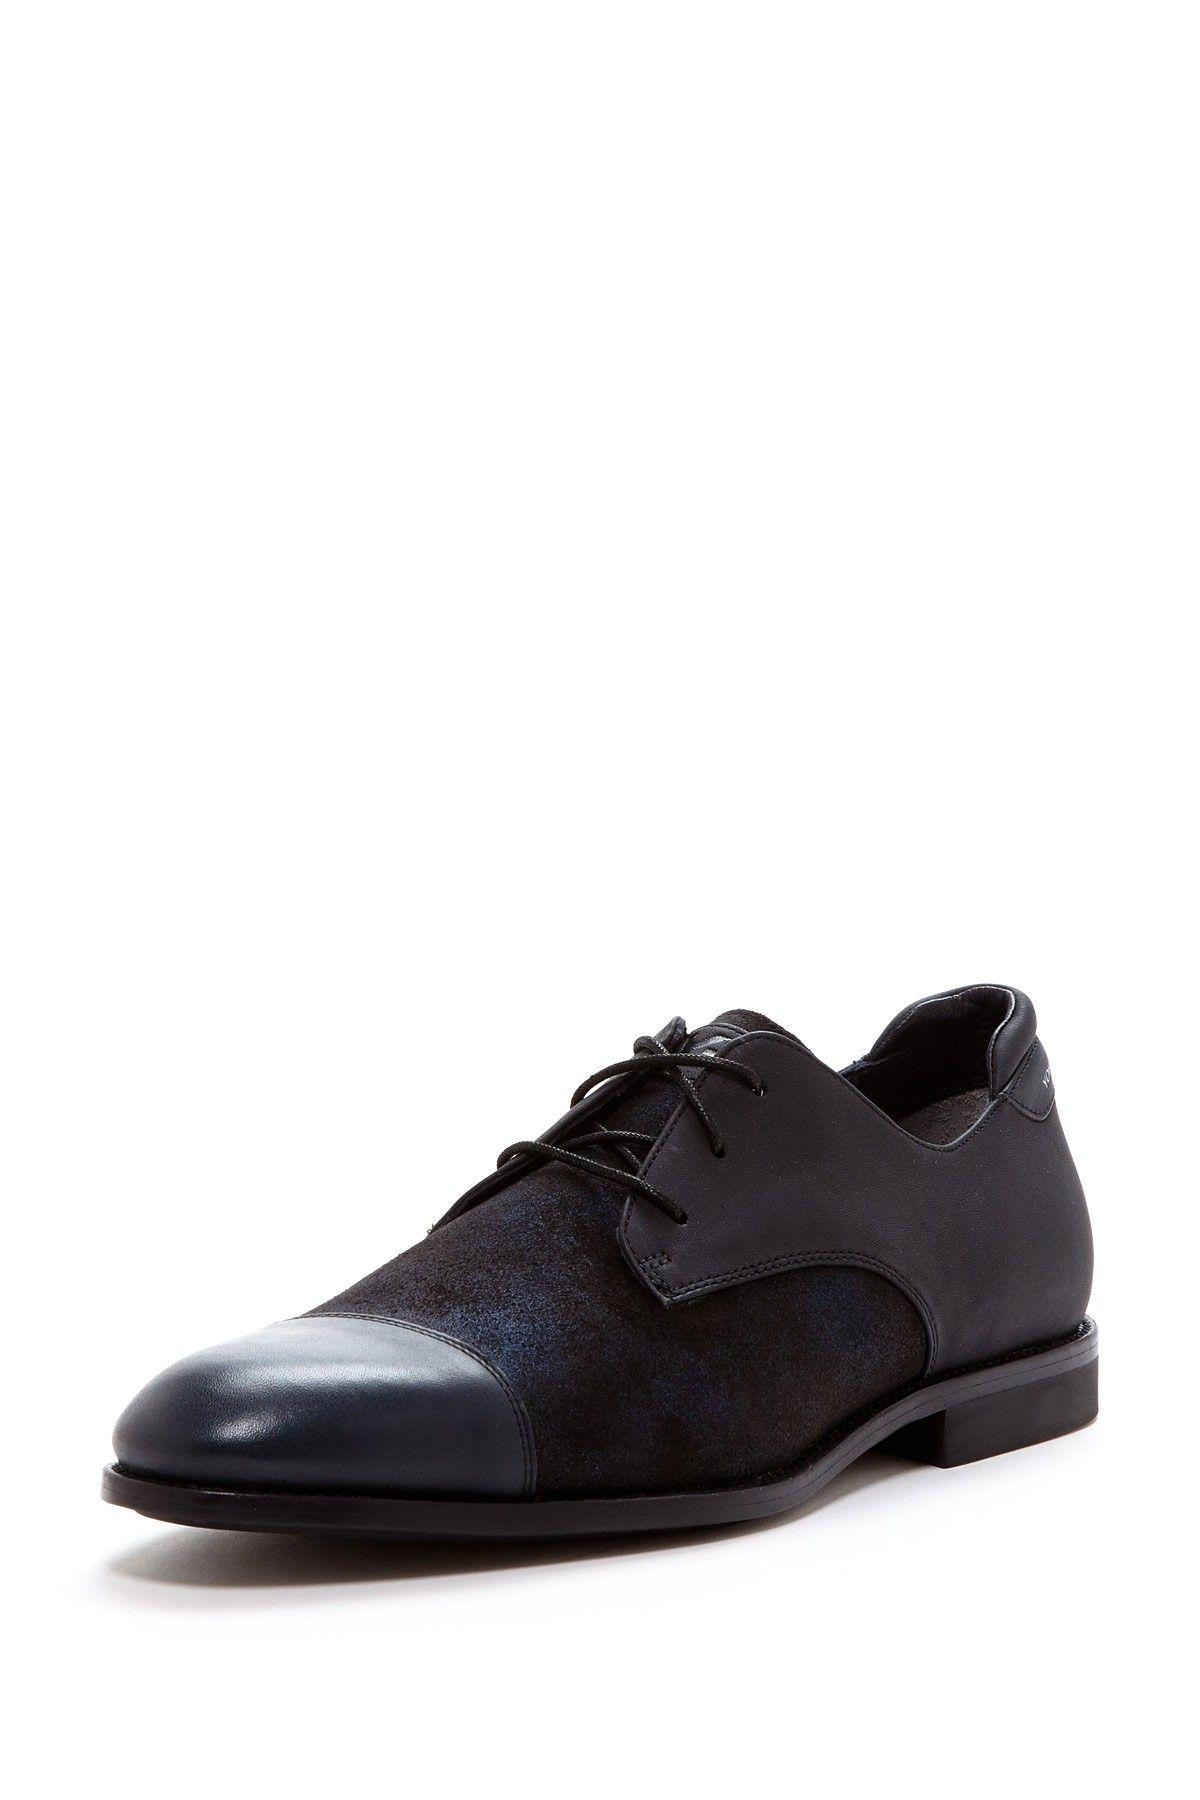 Y-3 by adidas Dress Oxford Dress #Cap #Lace-upMen #Shoes